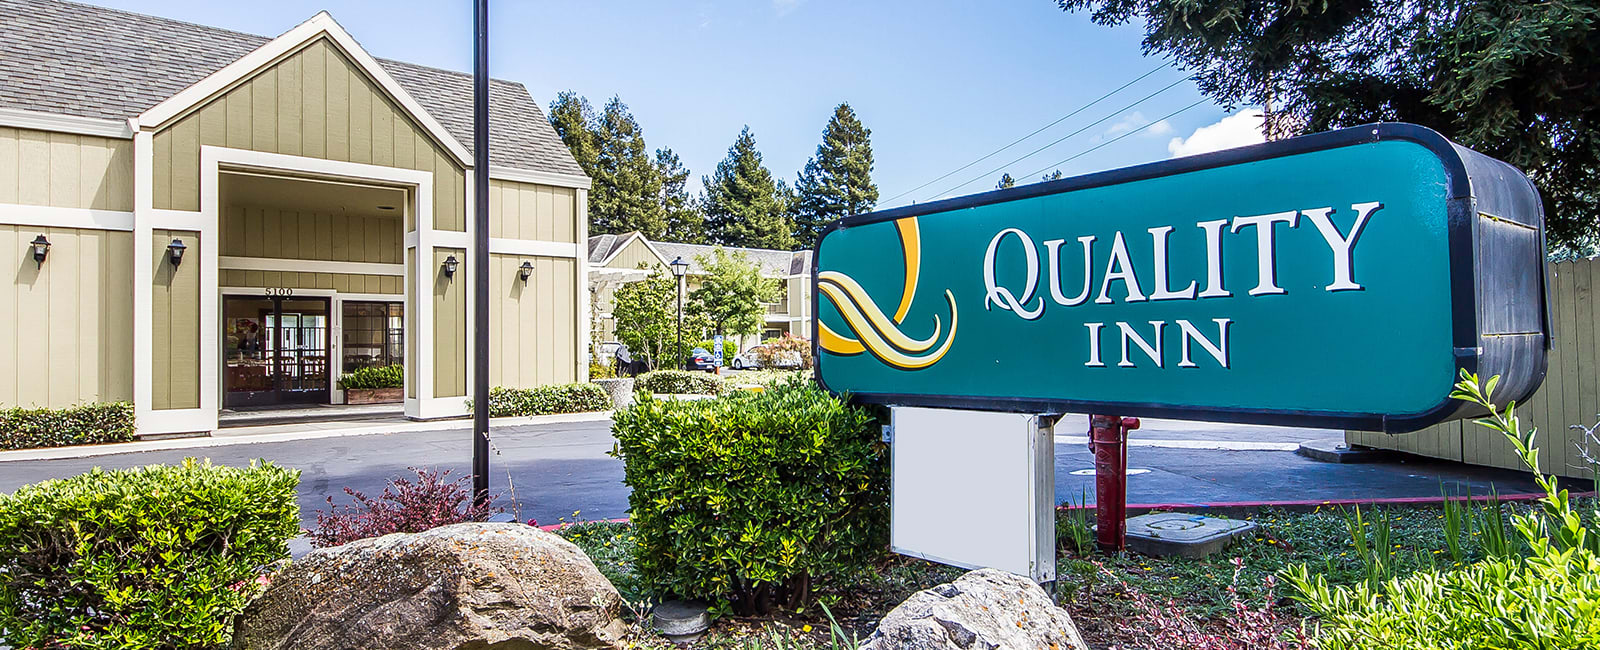 Location of Quality Inn Petaluma - Sonoma